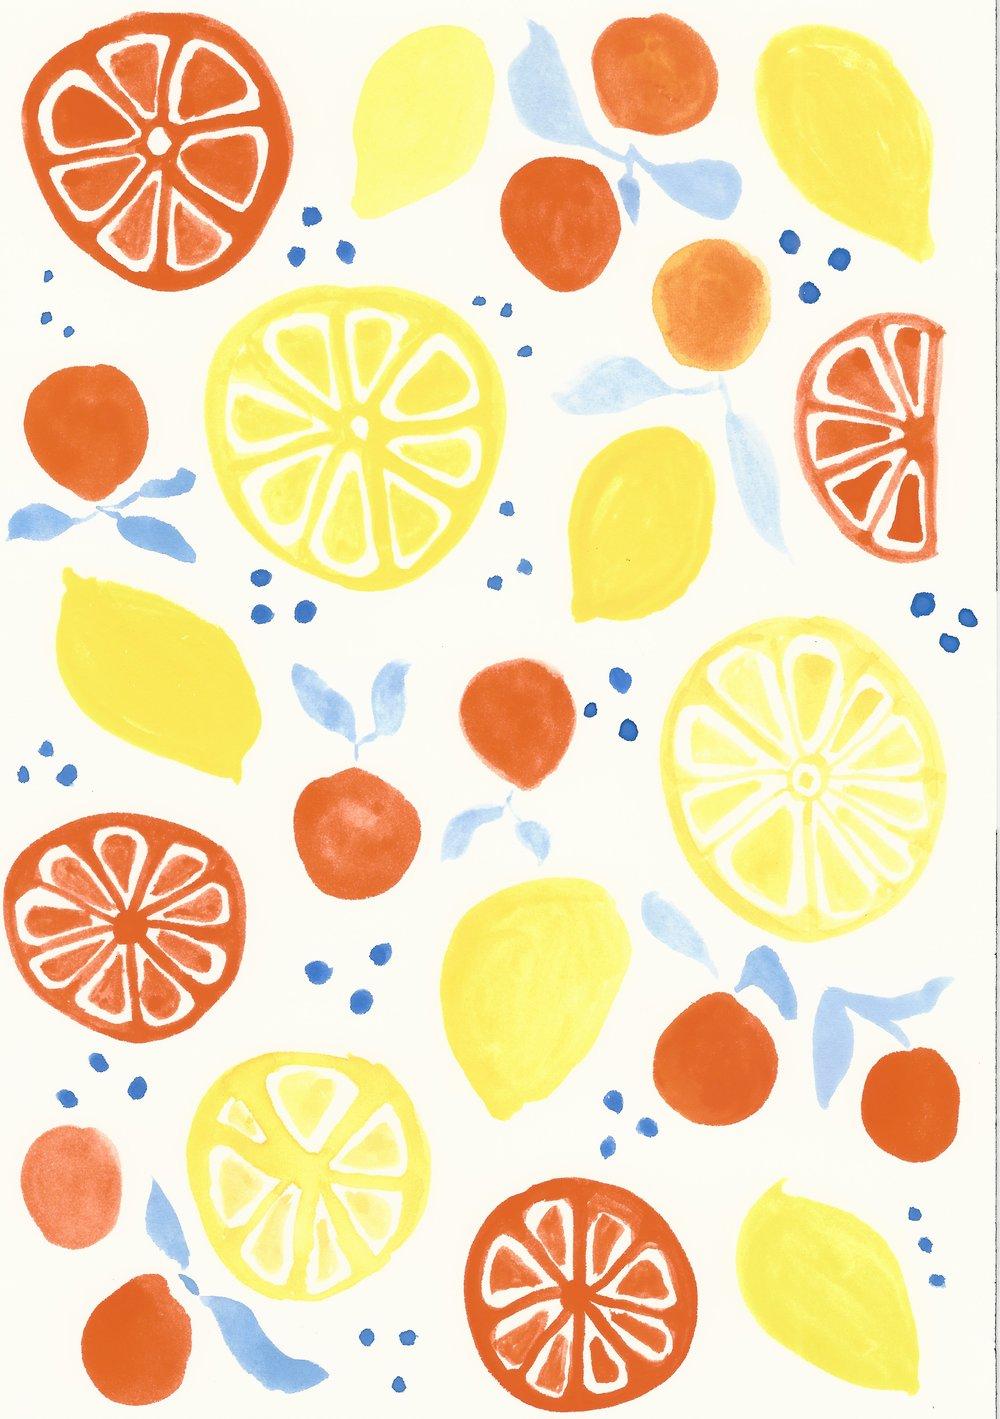 Day 28 Citruis fruit.jpeg